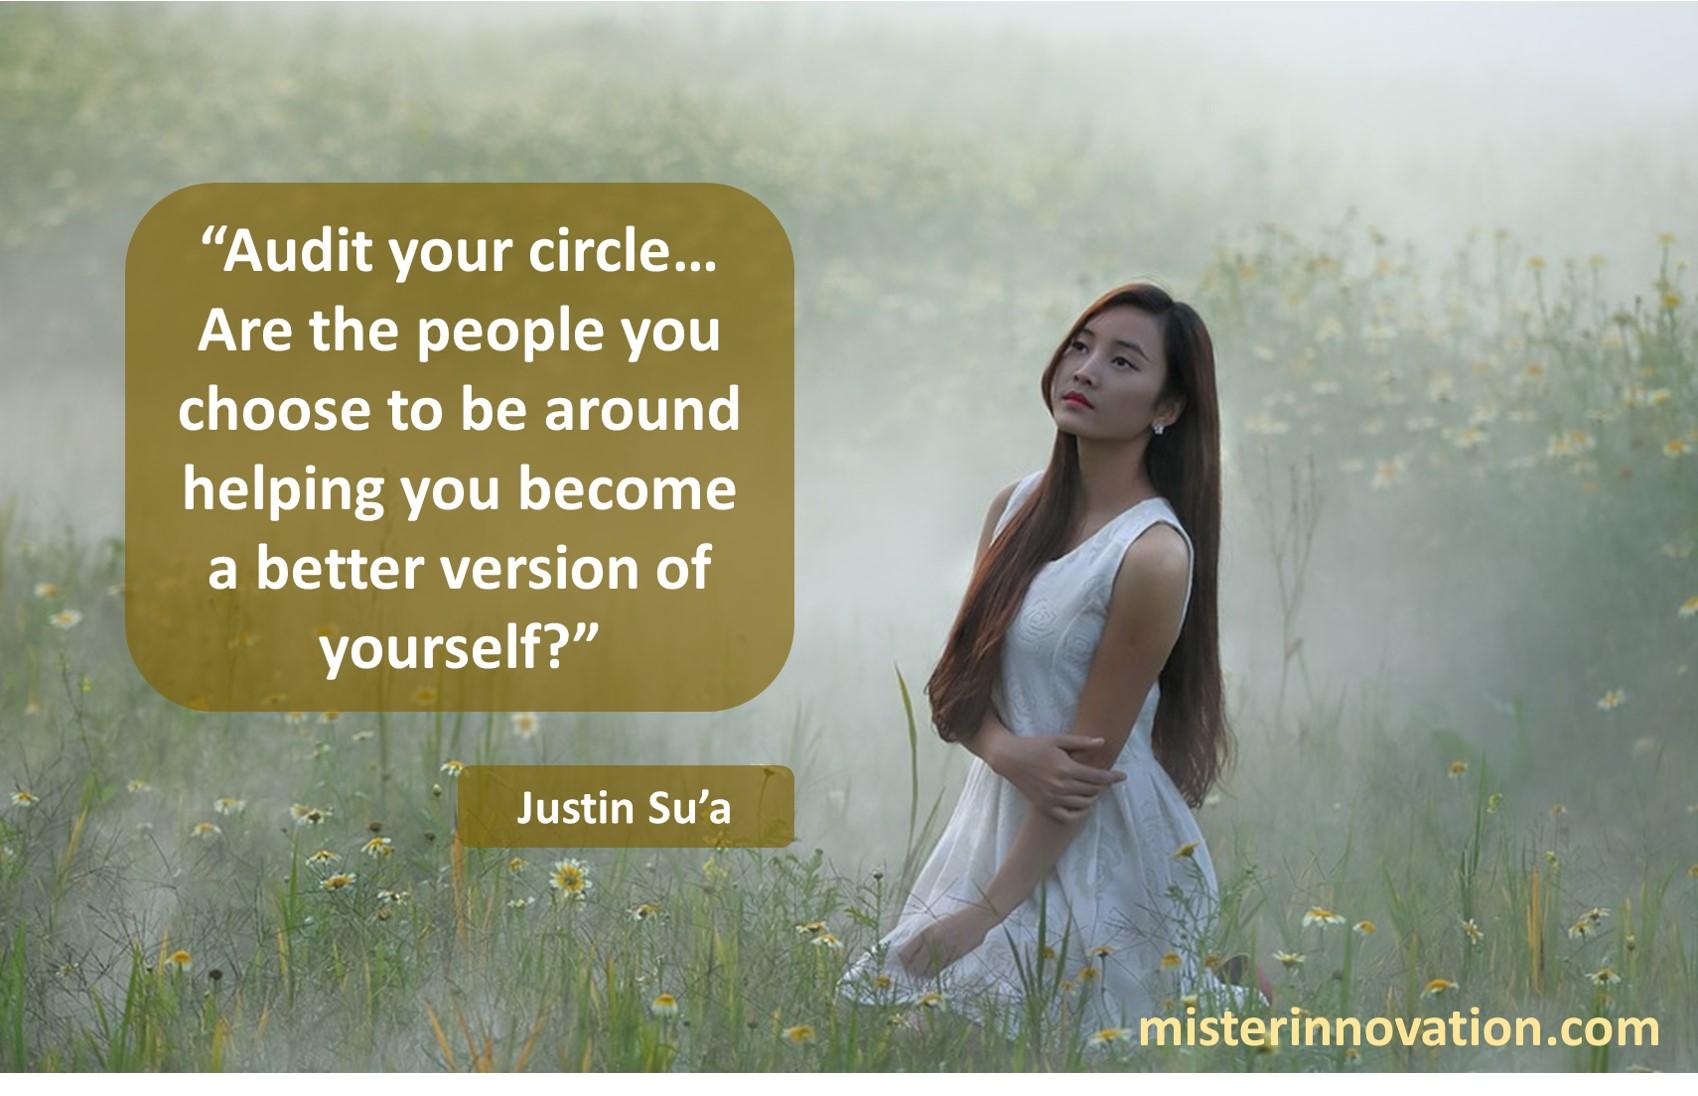 Justin Sua